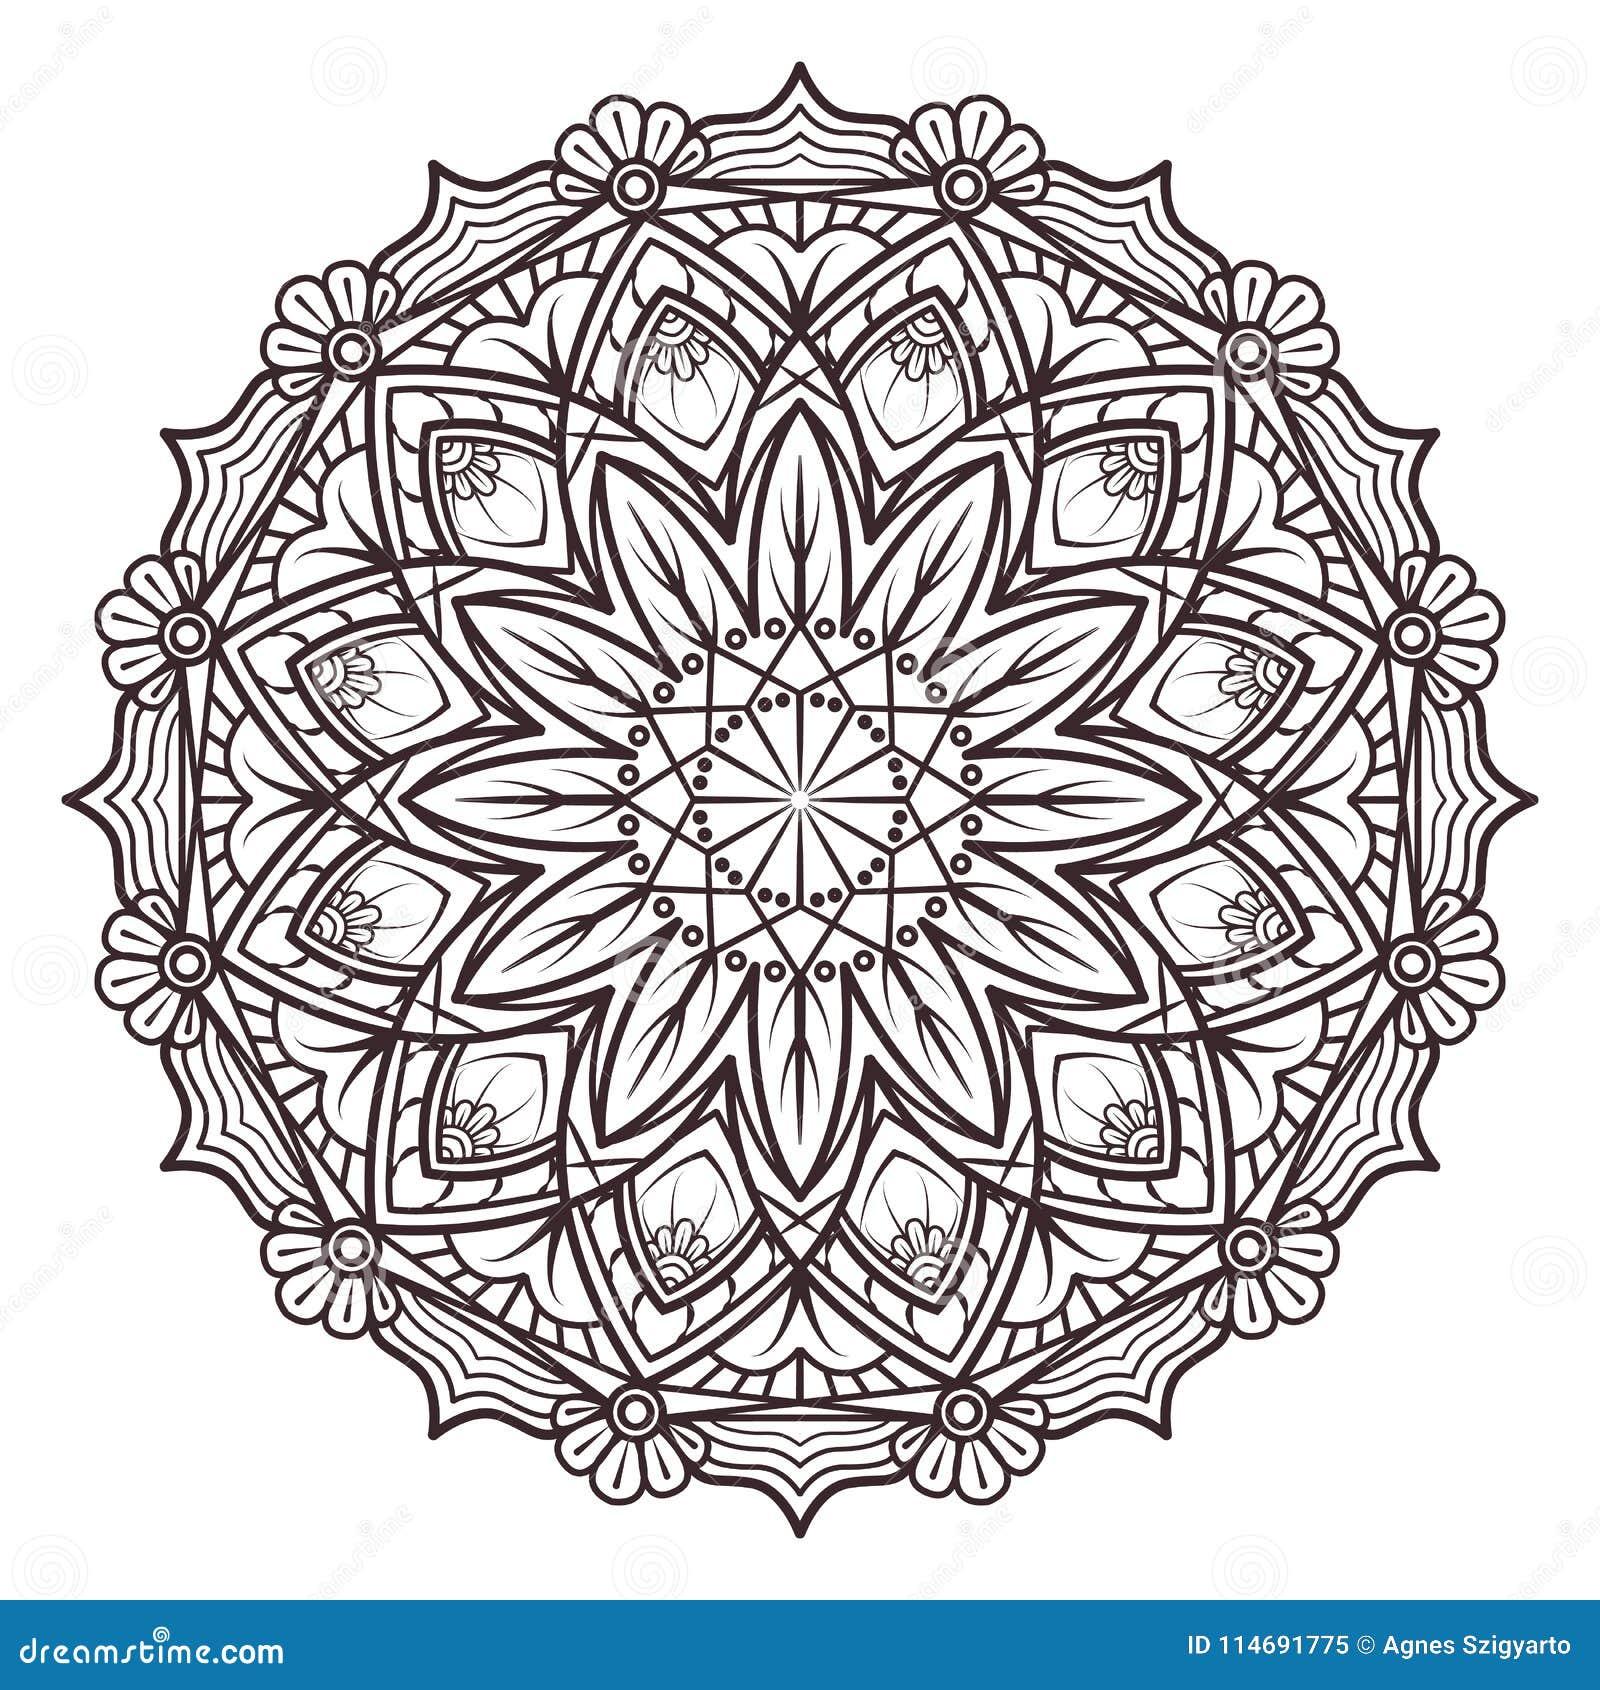 Mandala Designs For Adult Coloring Books, Decorations, Etc ...